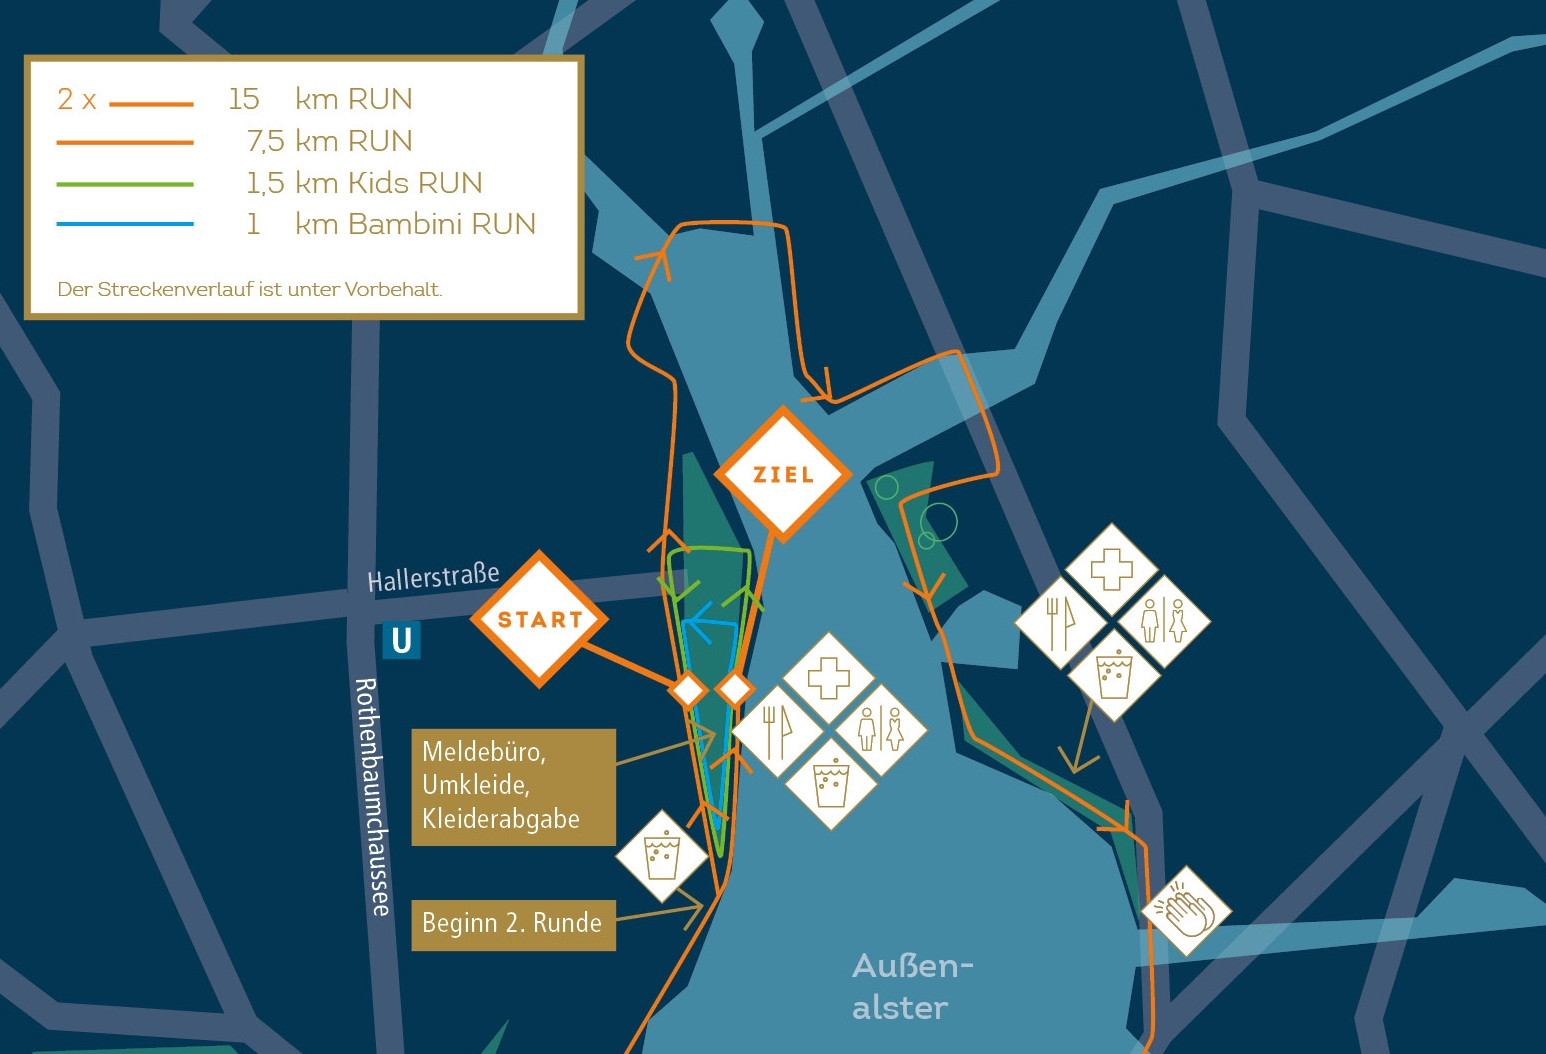 SPS RUN HAMBURG 2020 b 1 - Laufveranstaltung